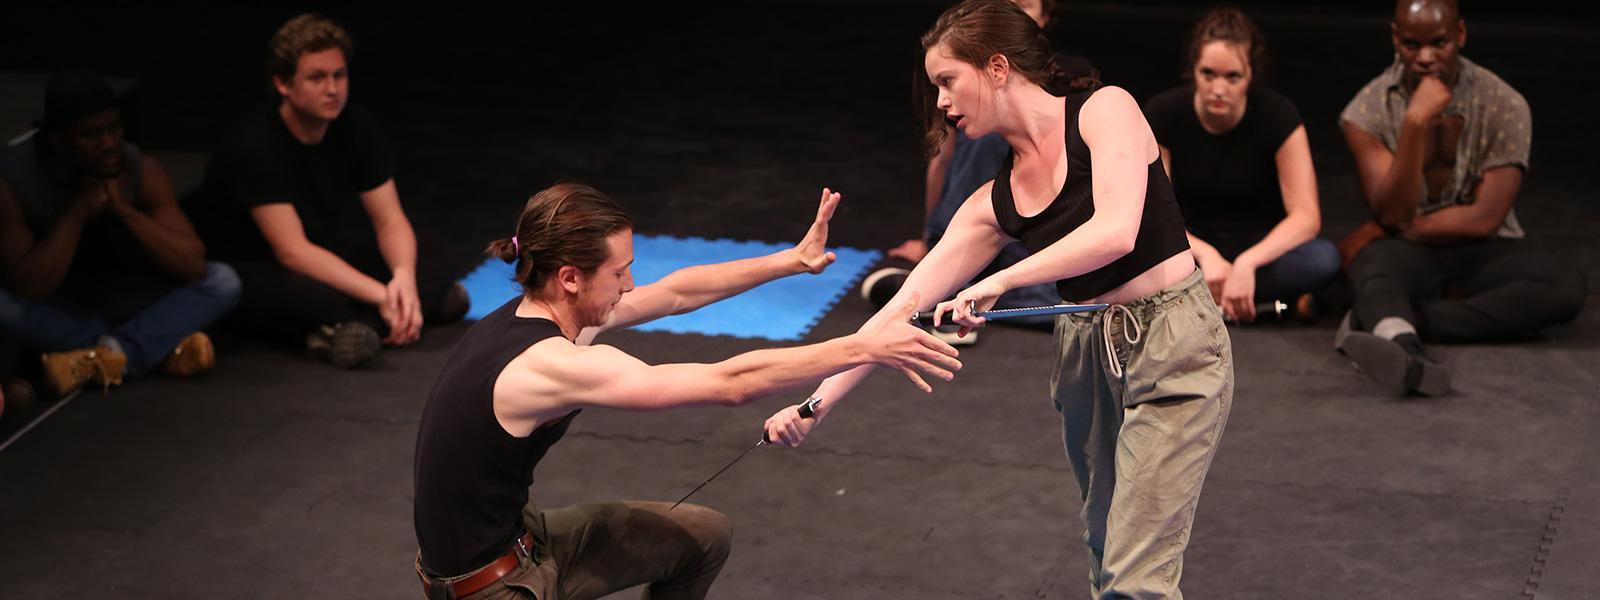 Samuel Farnsworth and Julia Crytser, fight demonstration